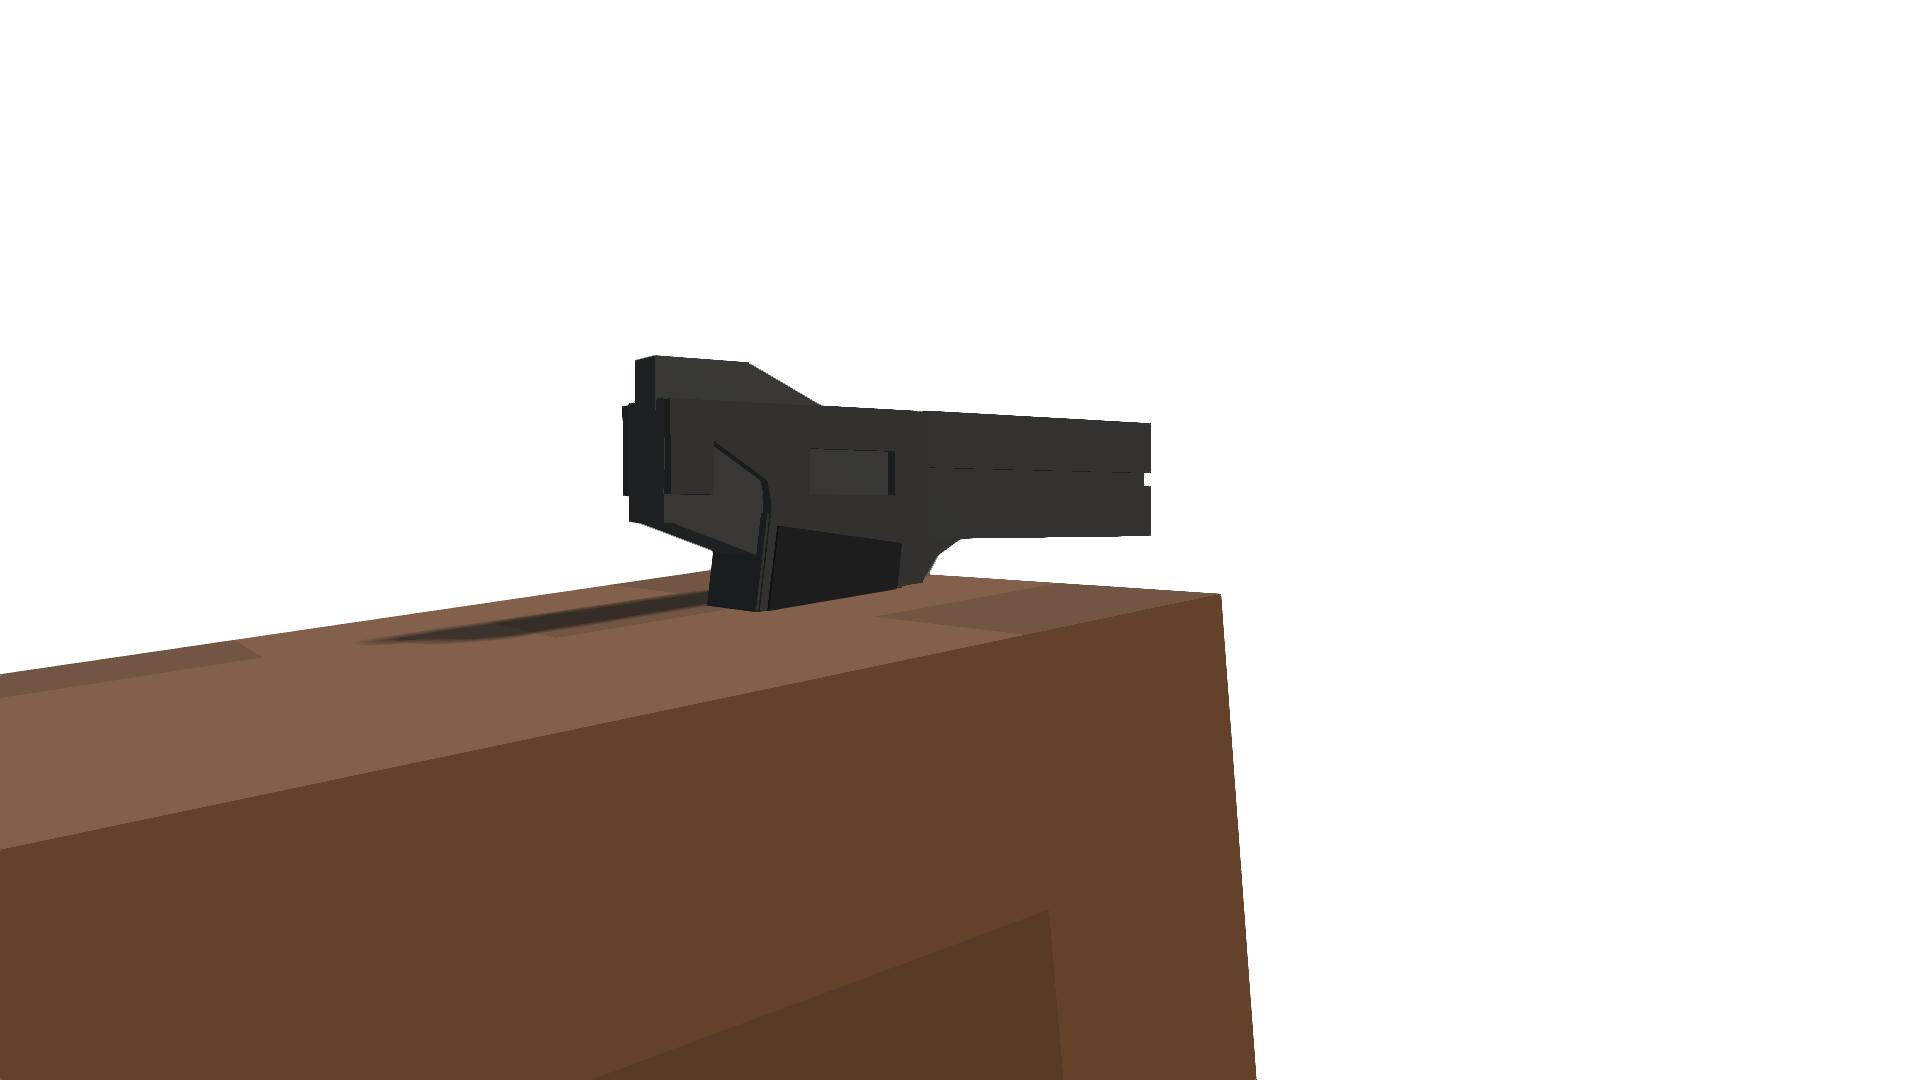 kolibri gun battlefield 1